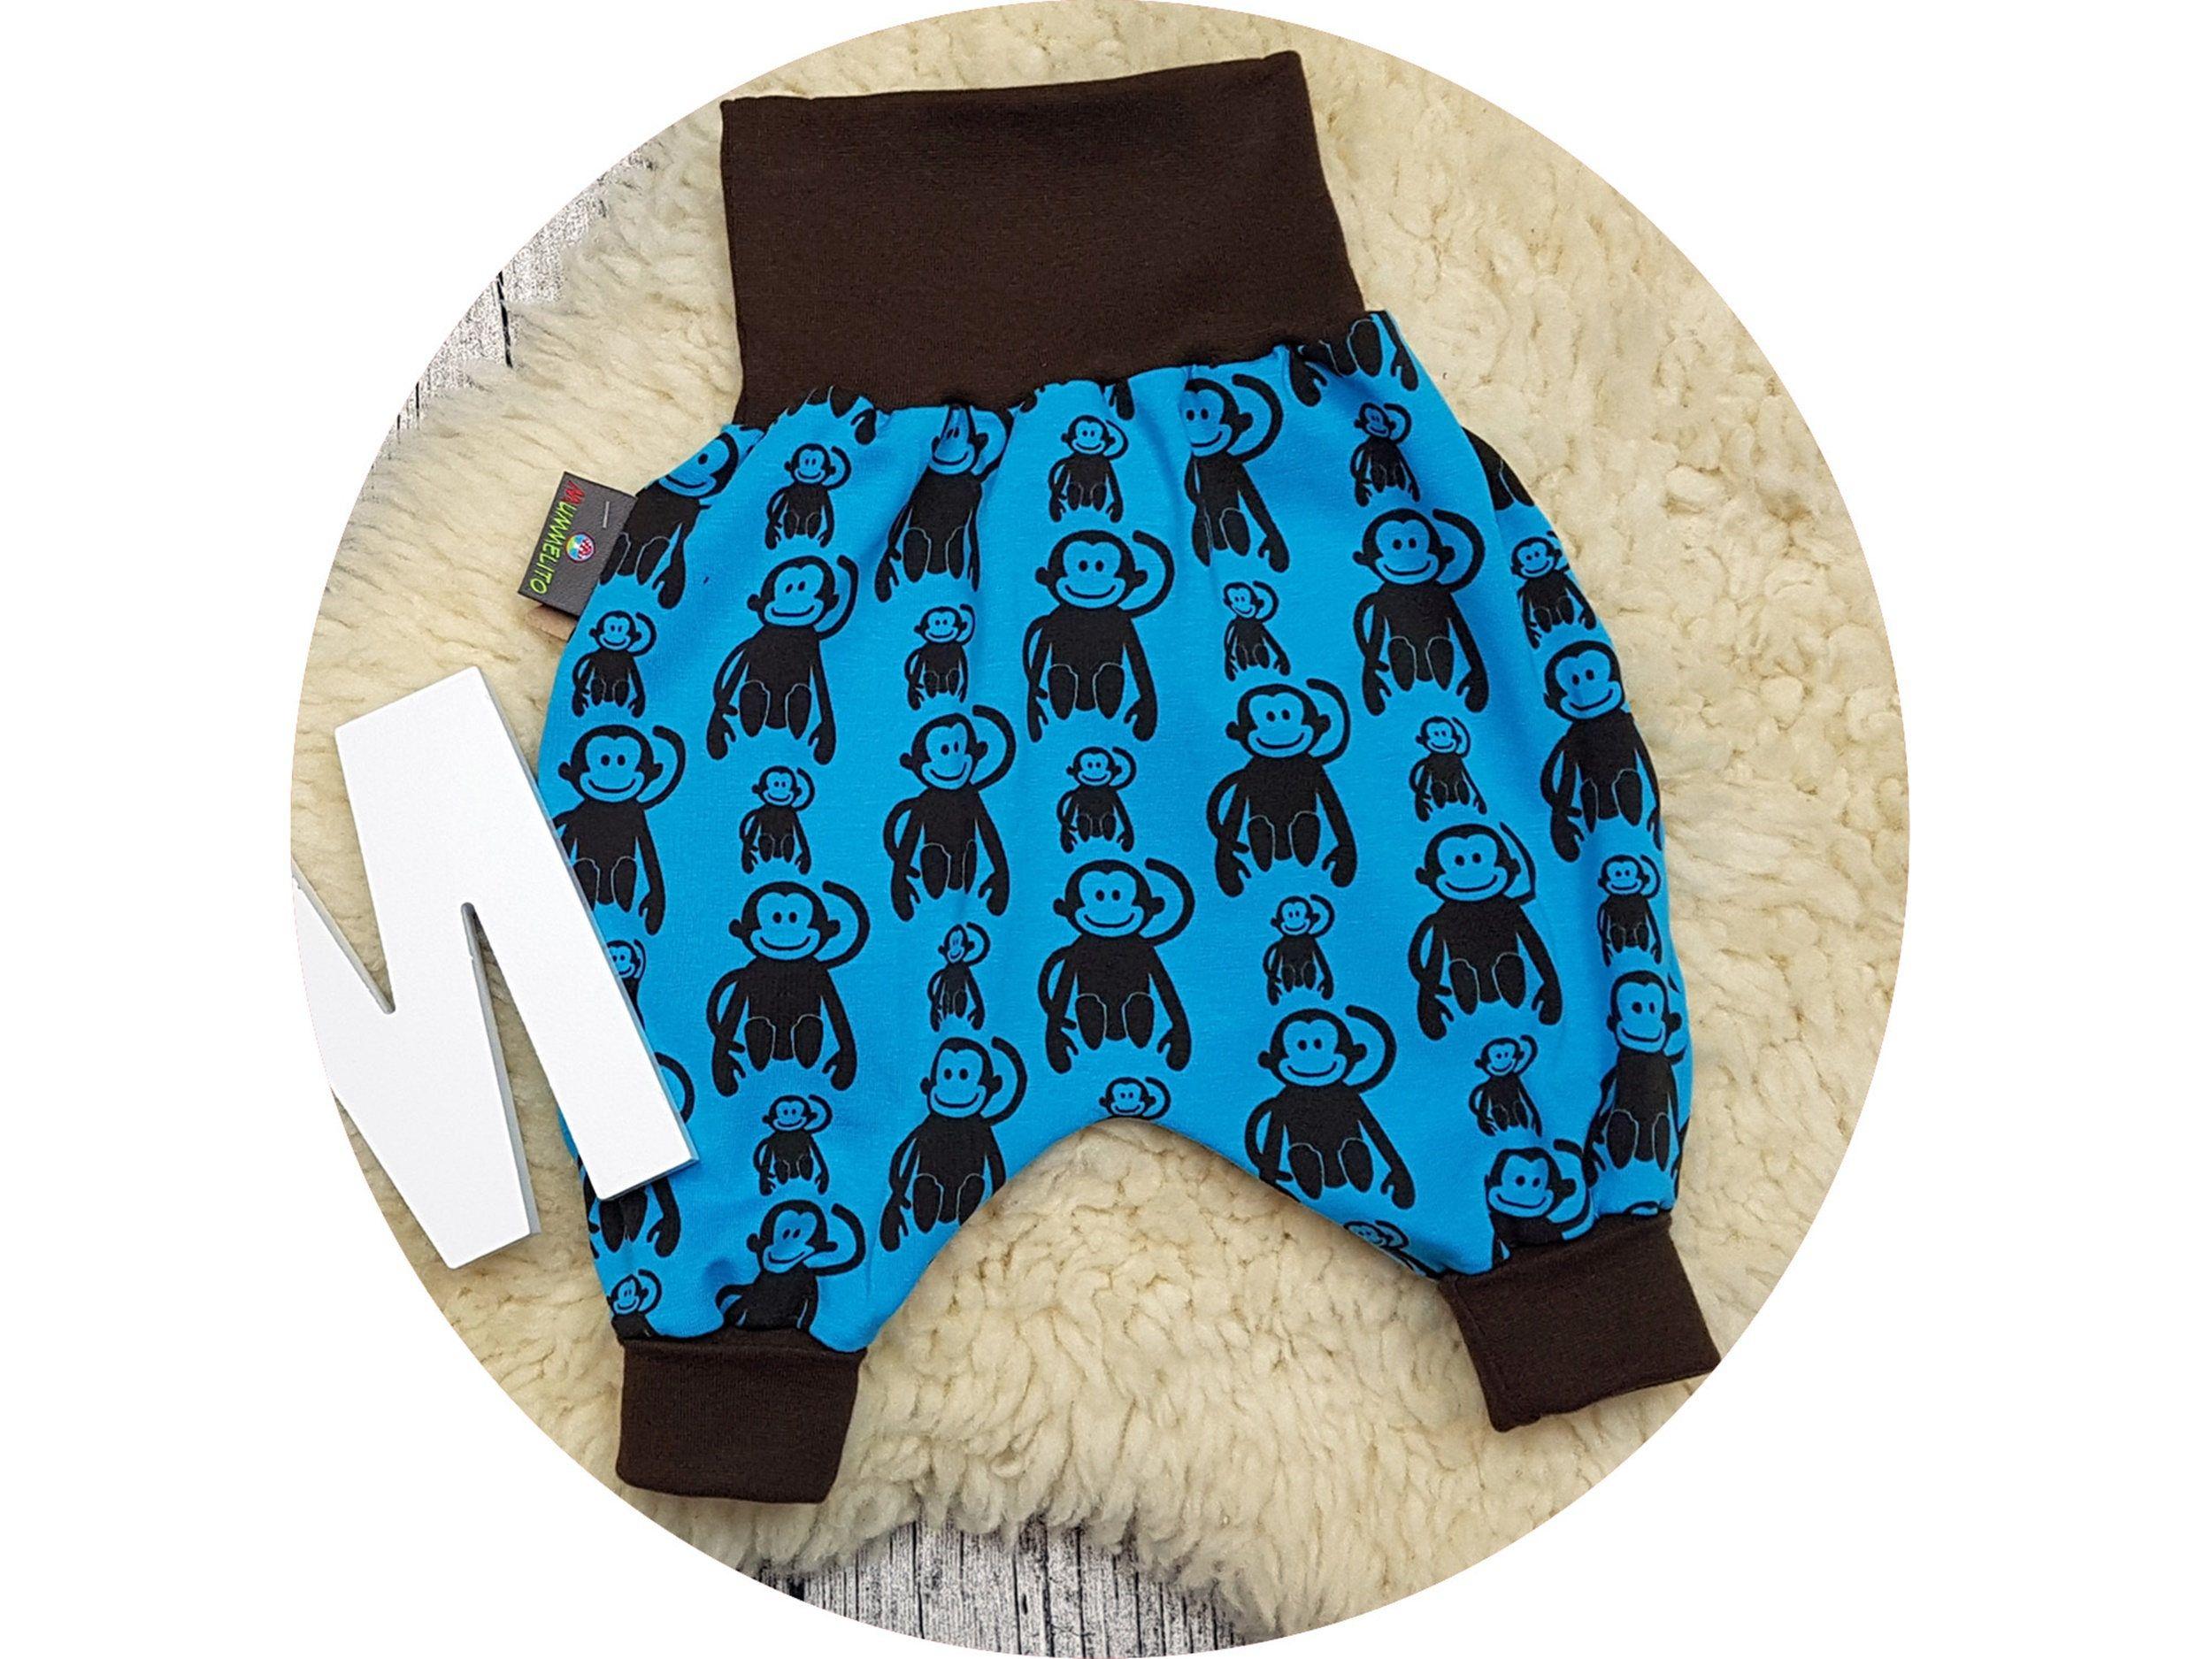 brand new 0a01a 8fad5 Hose, Babyhose, Baby, Affe, Affen, Zoo, Tiere, monkey ...